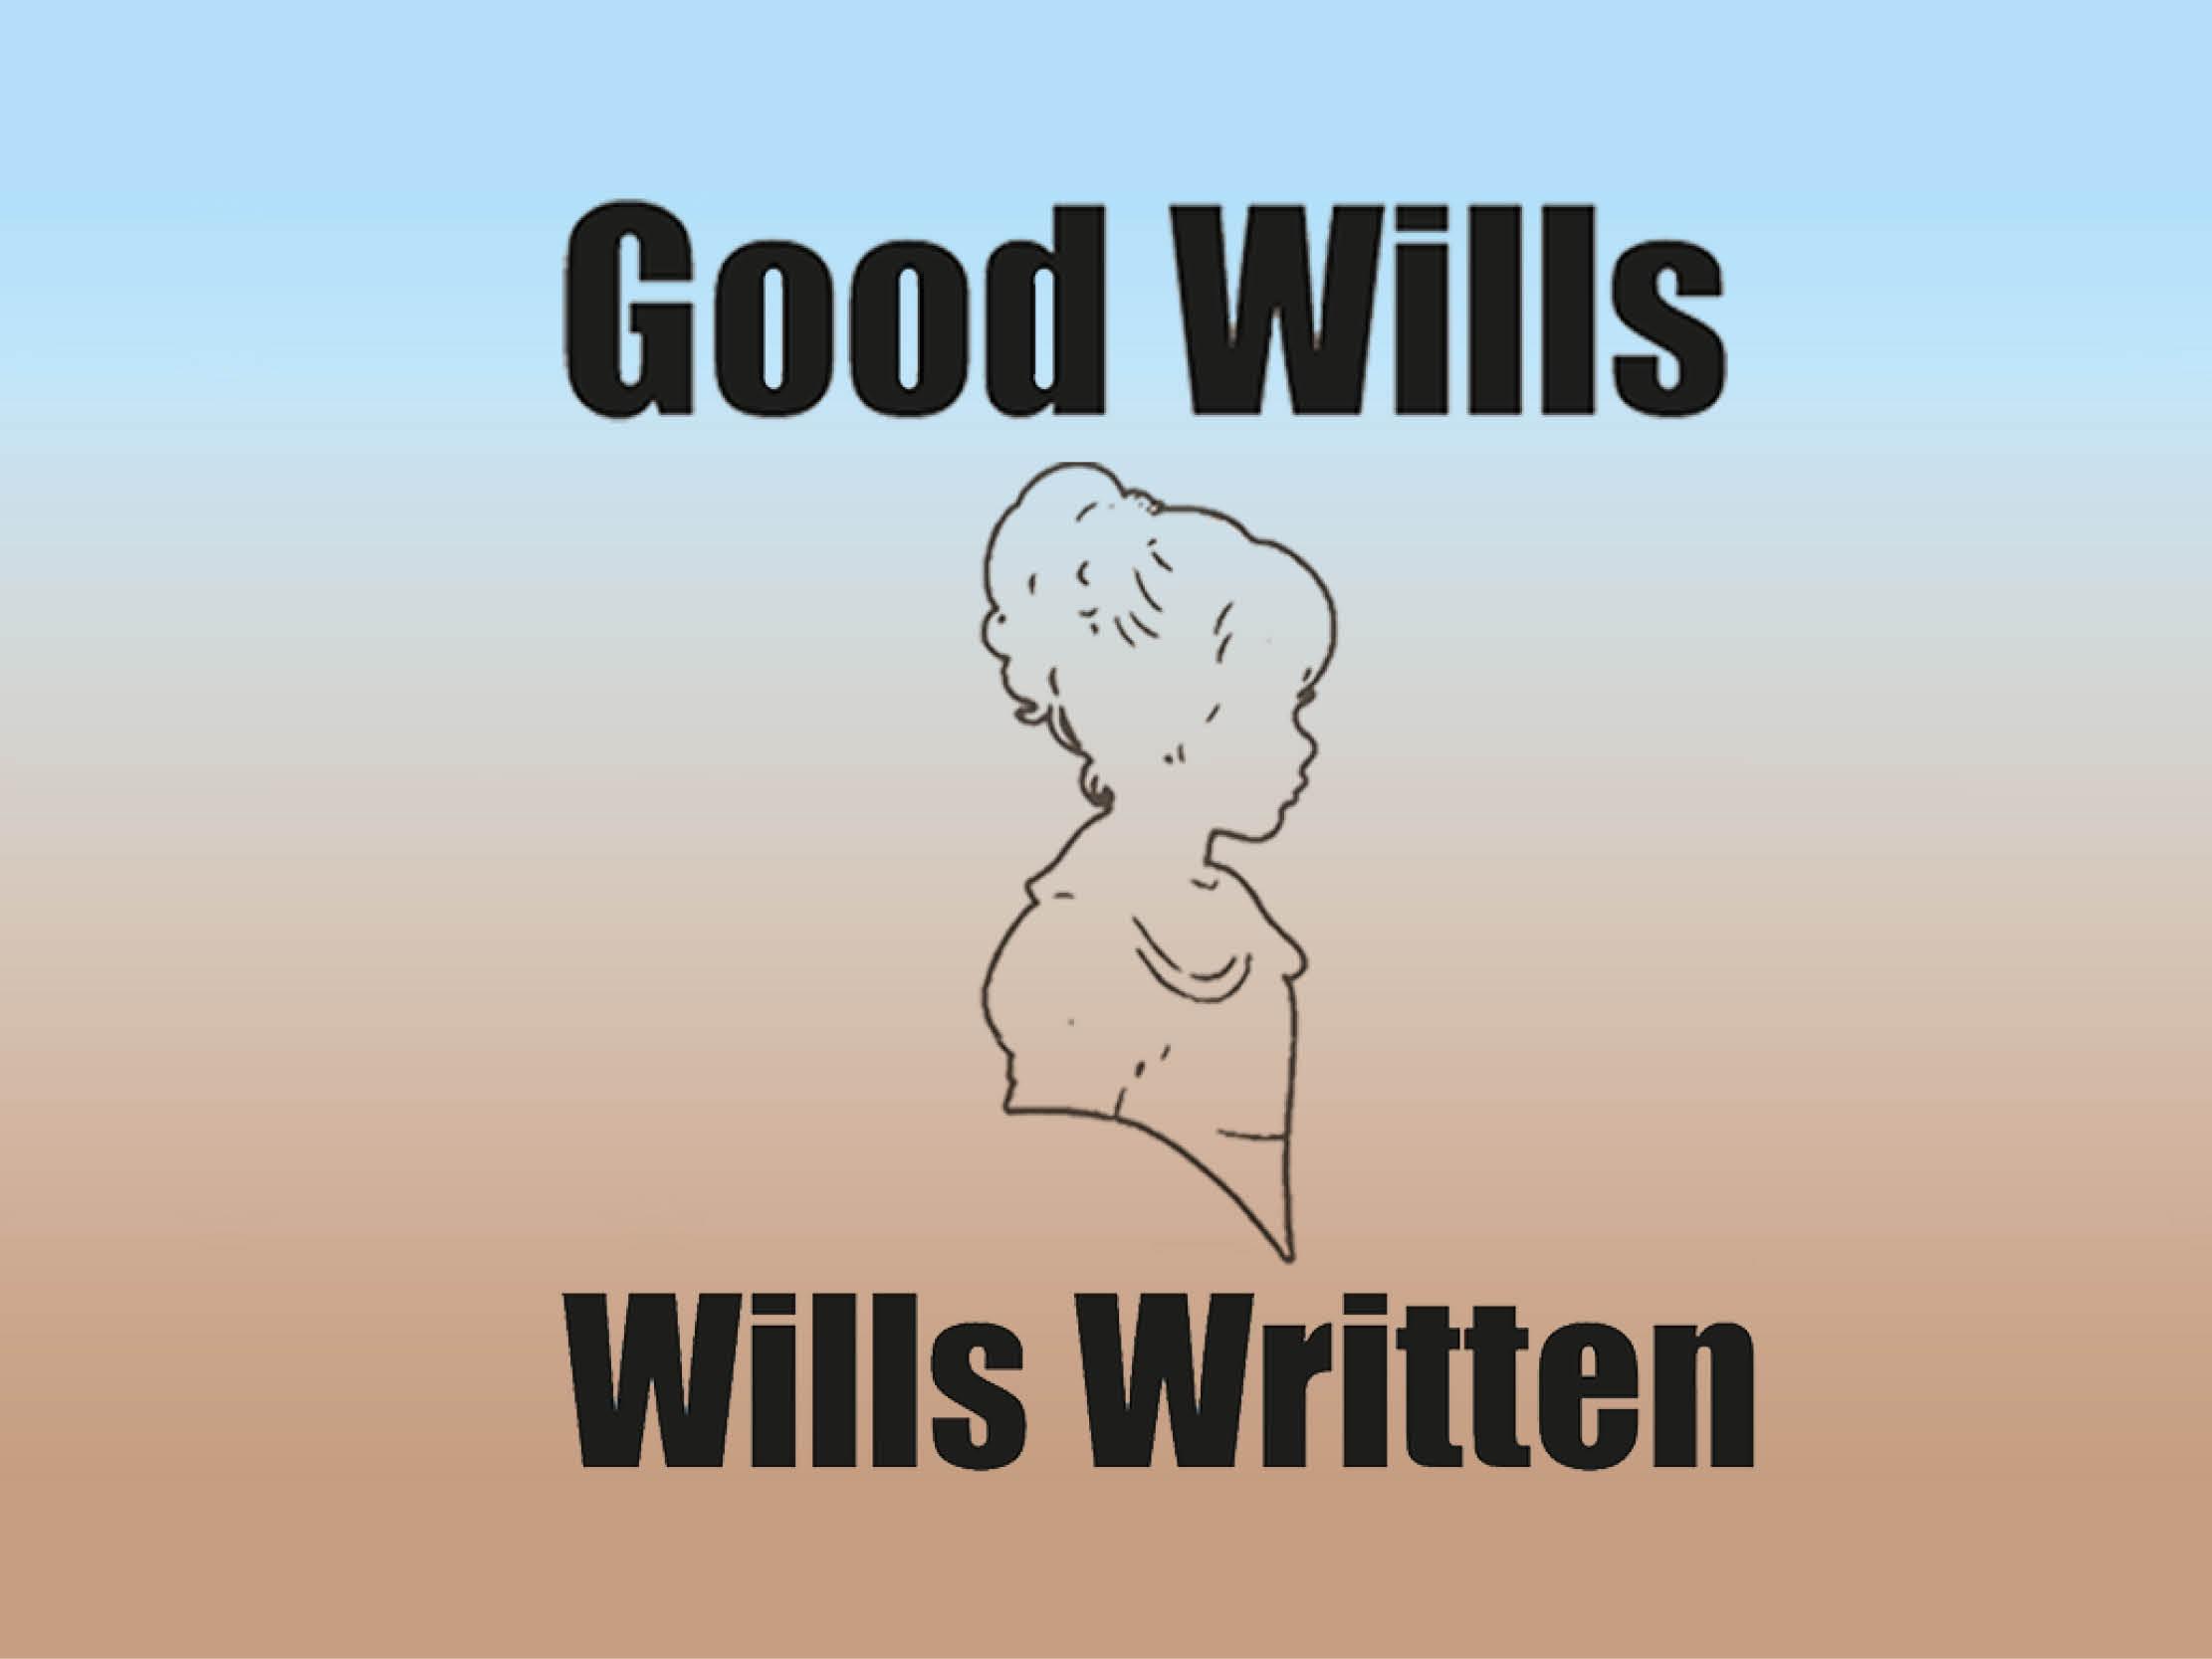 Good Wills